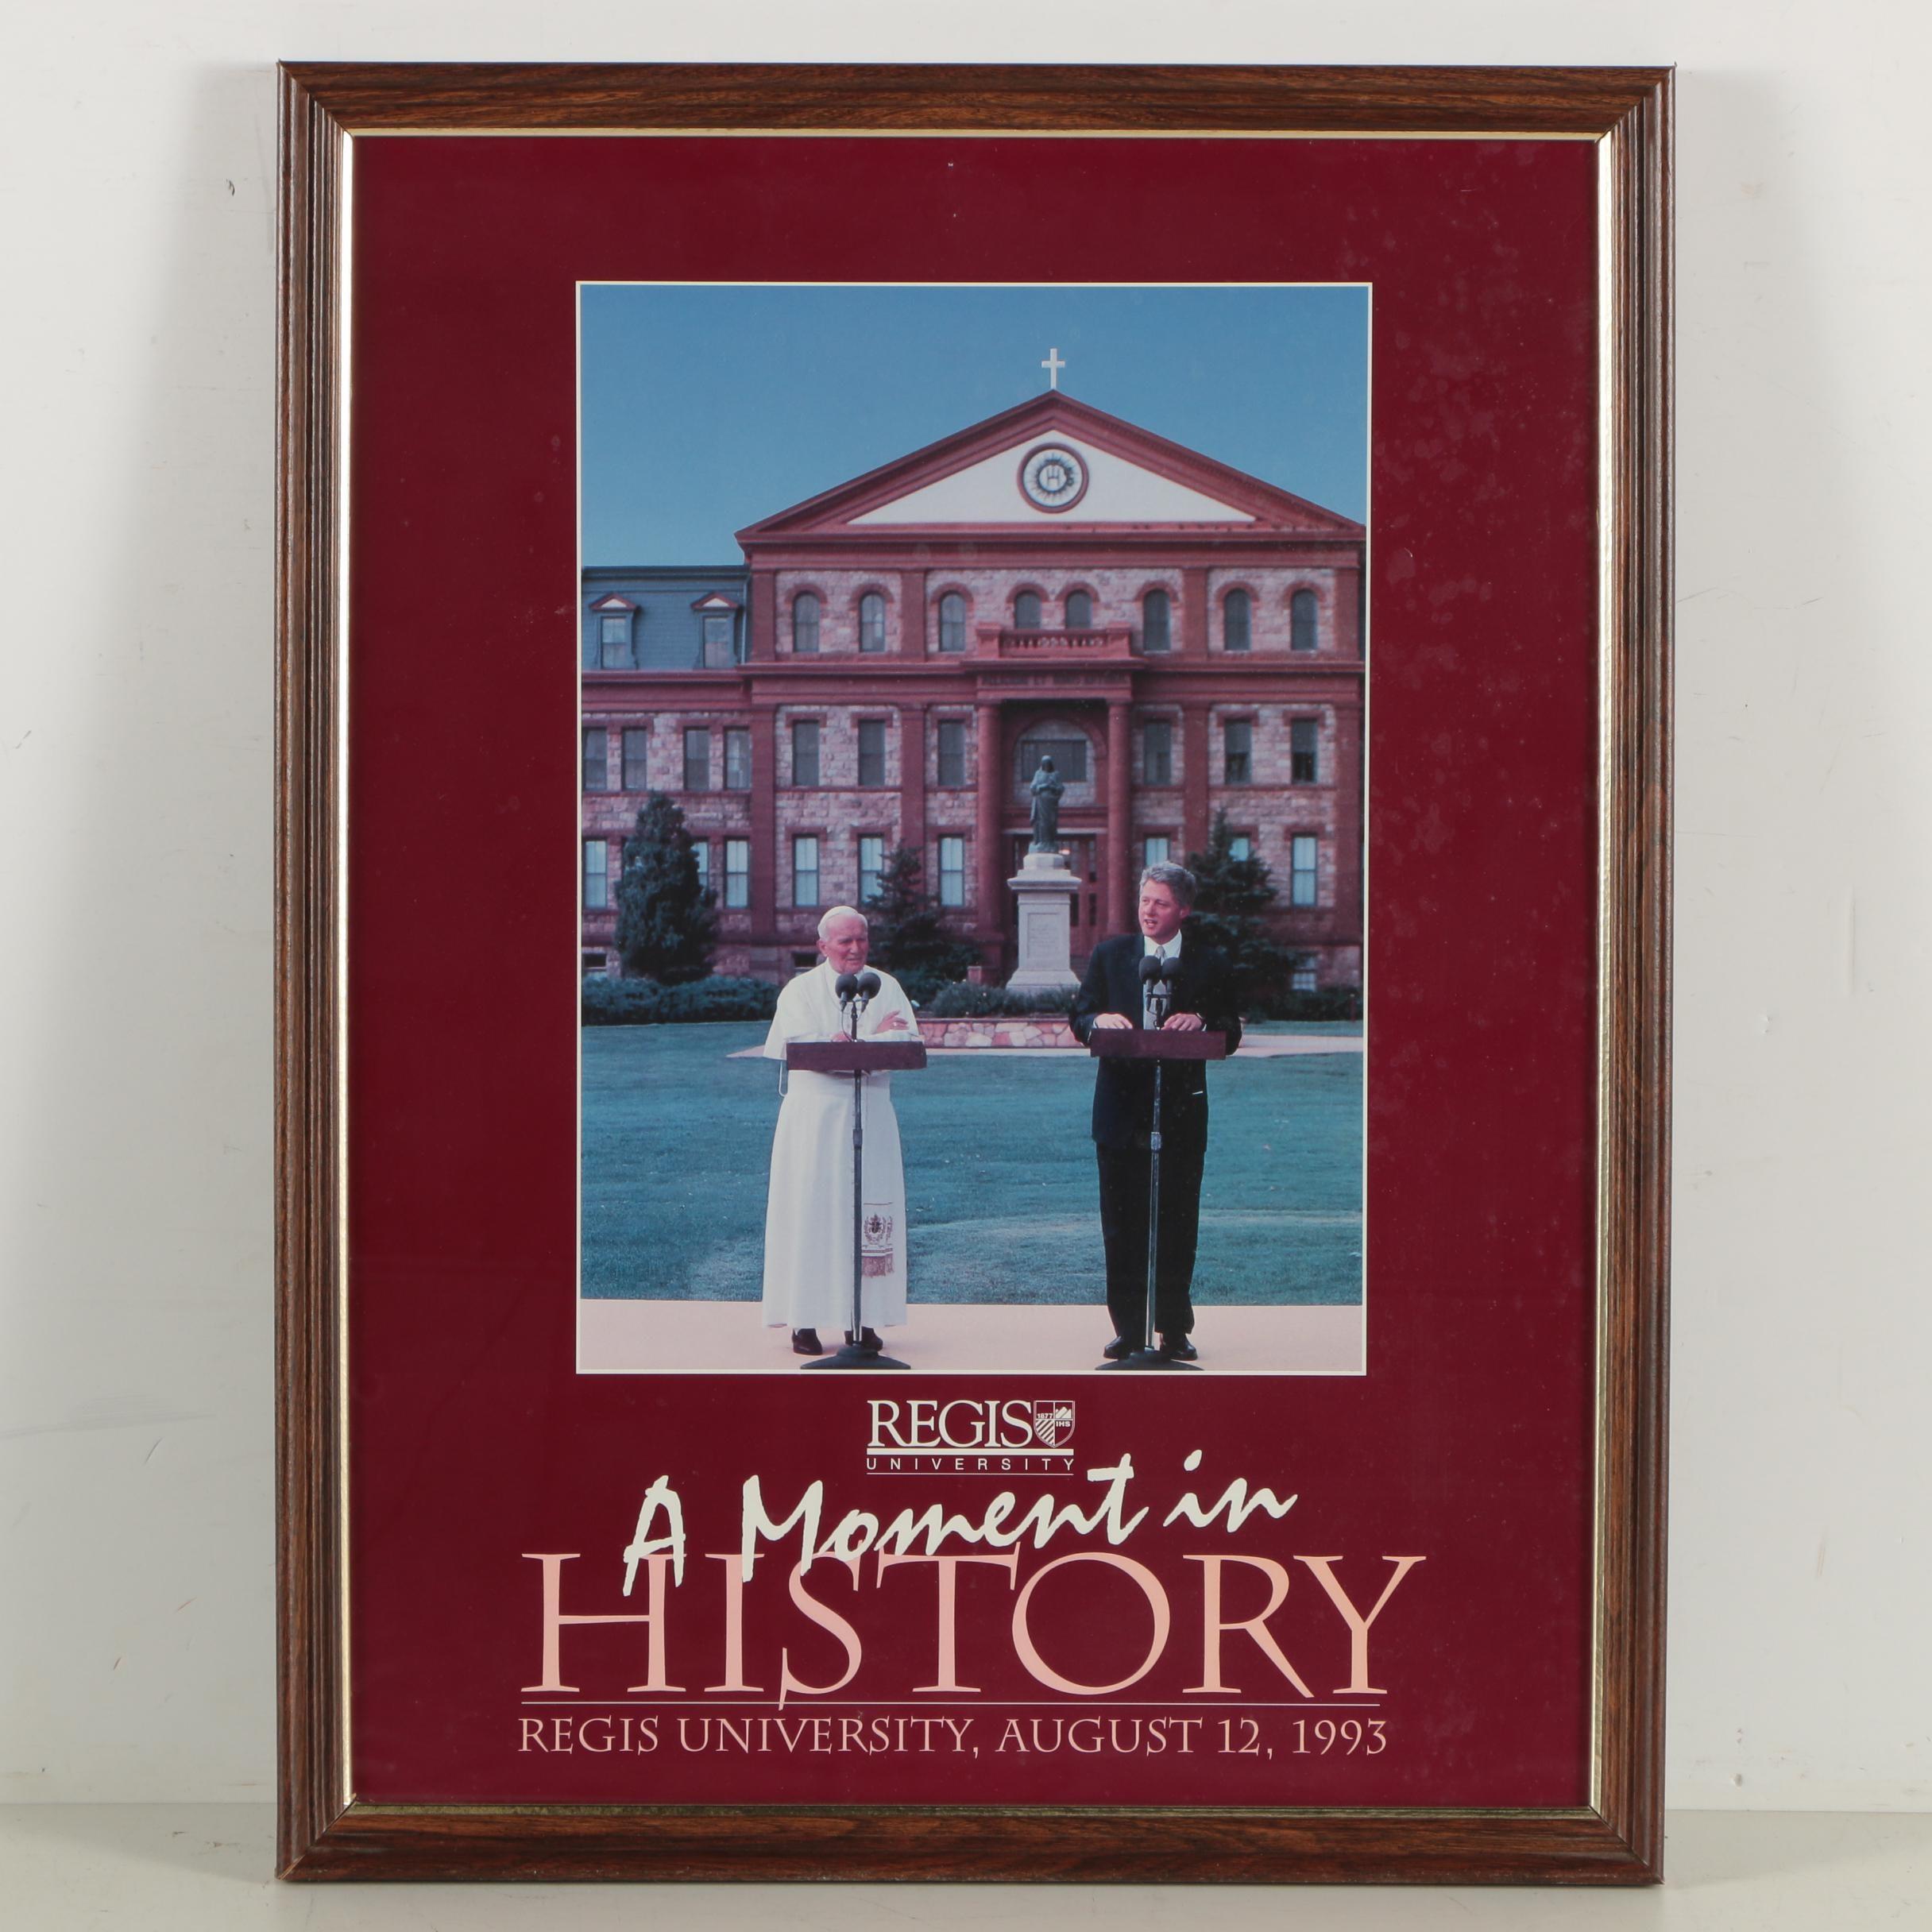 Regis University Poster with Pope John Paul II and Bill Clinton